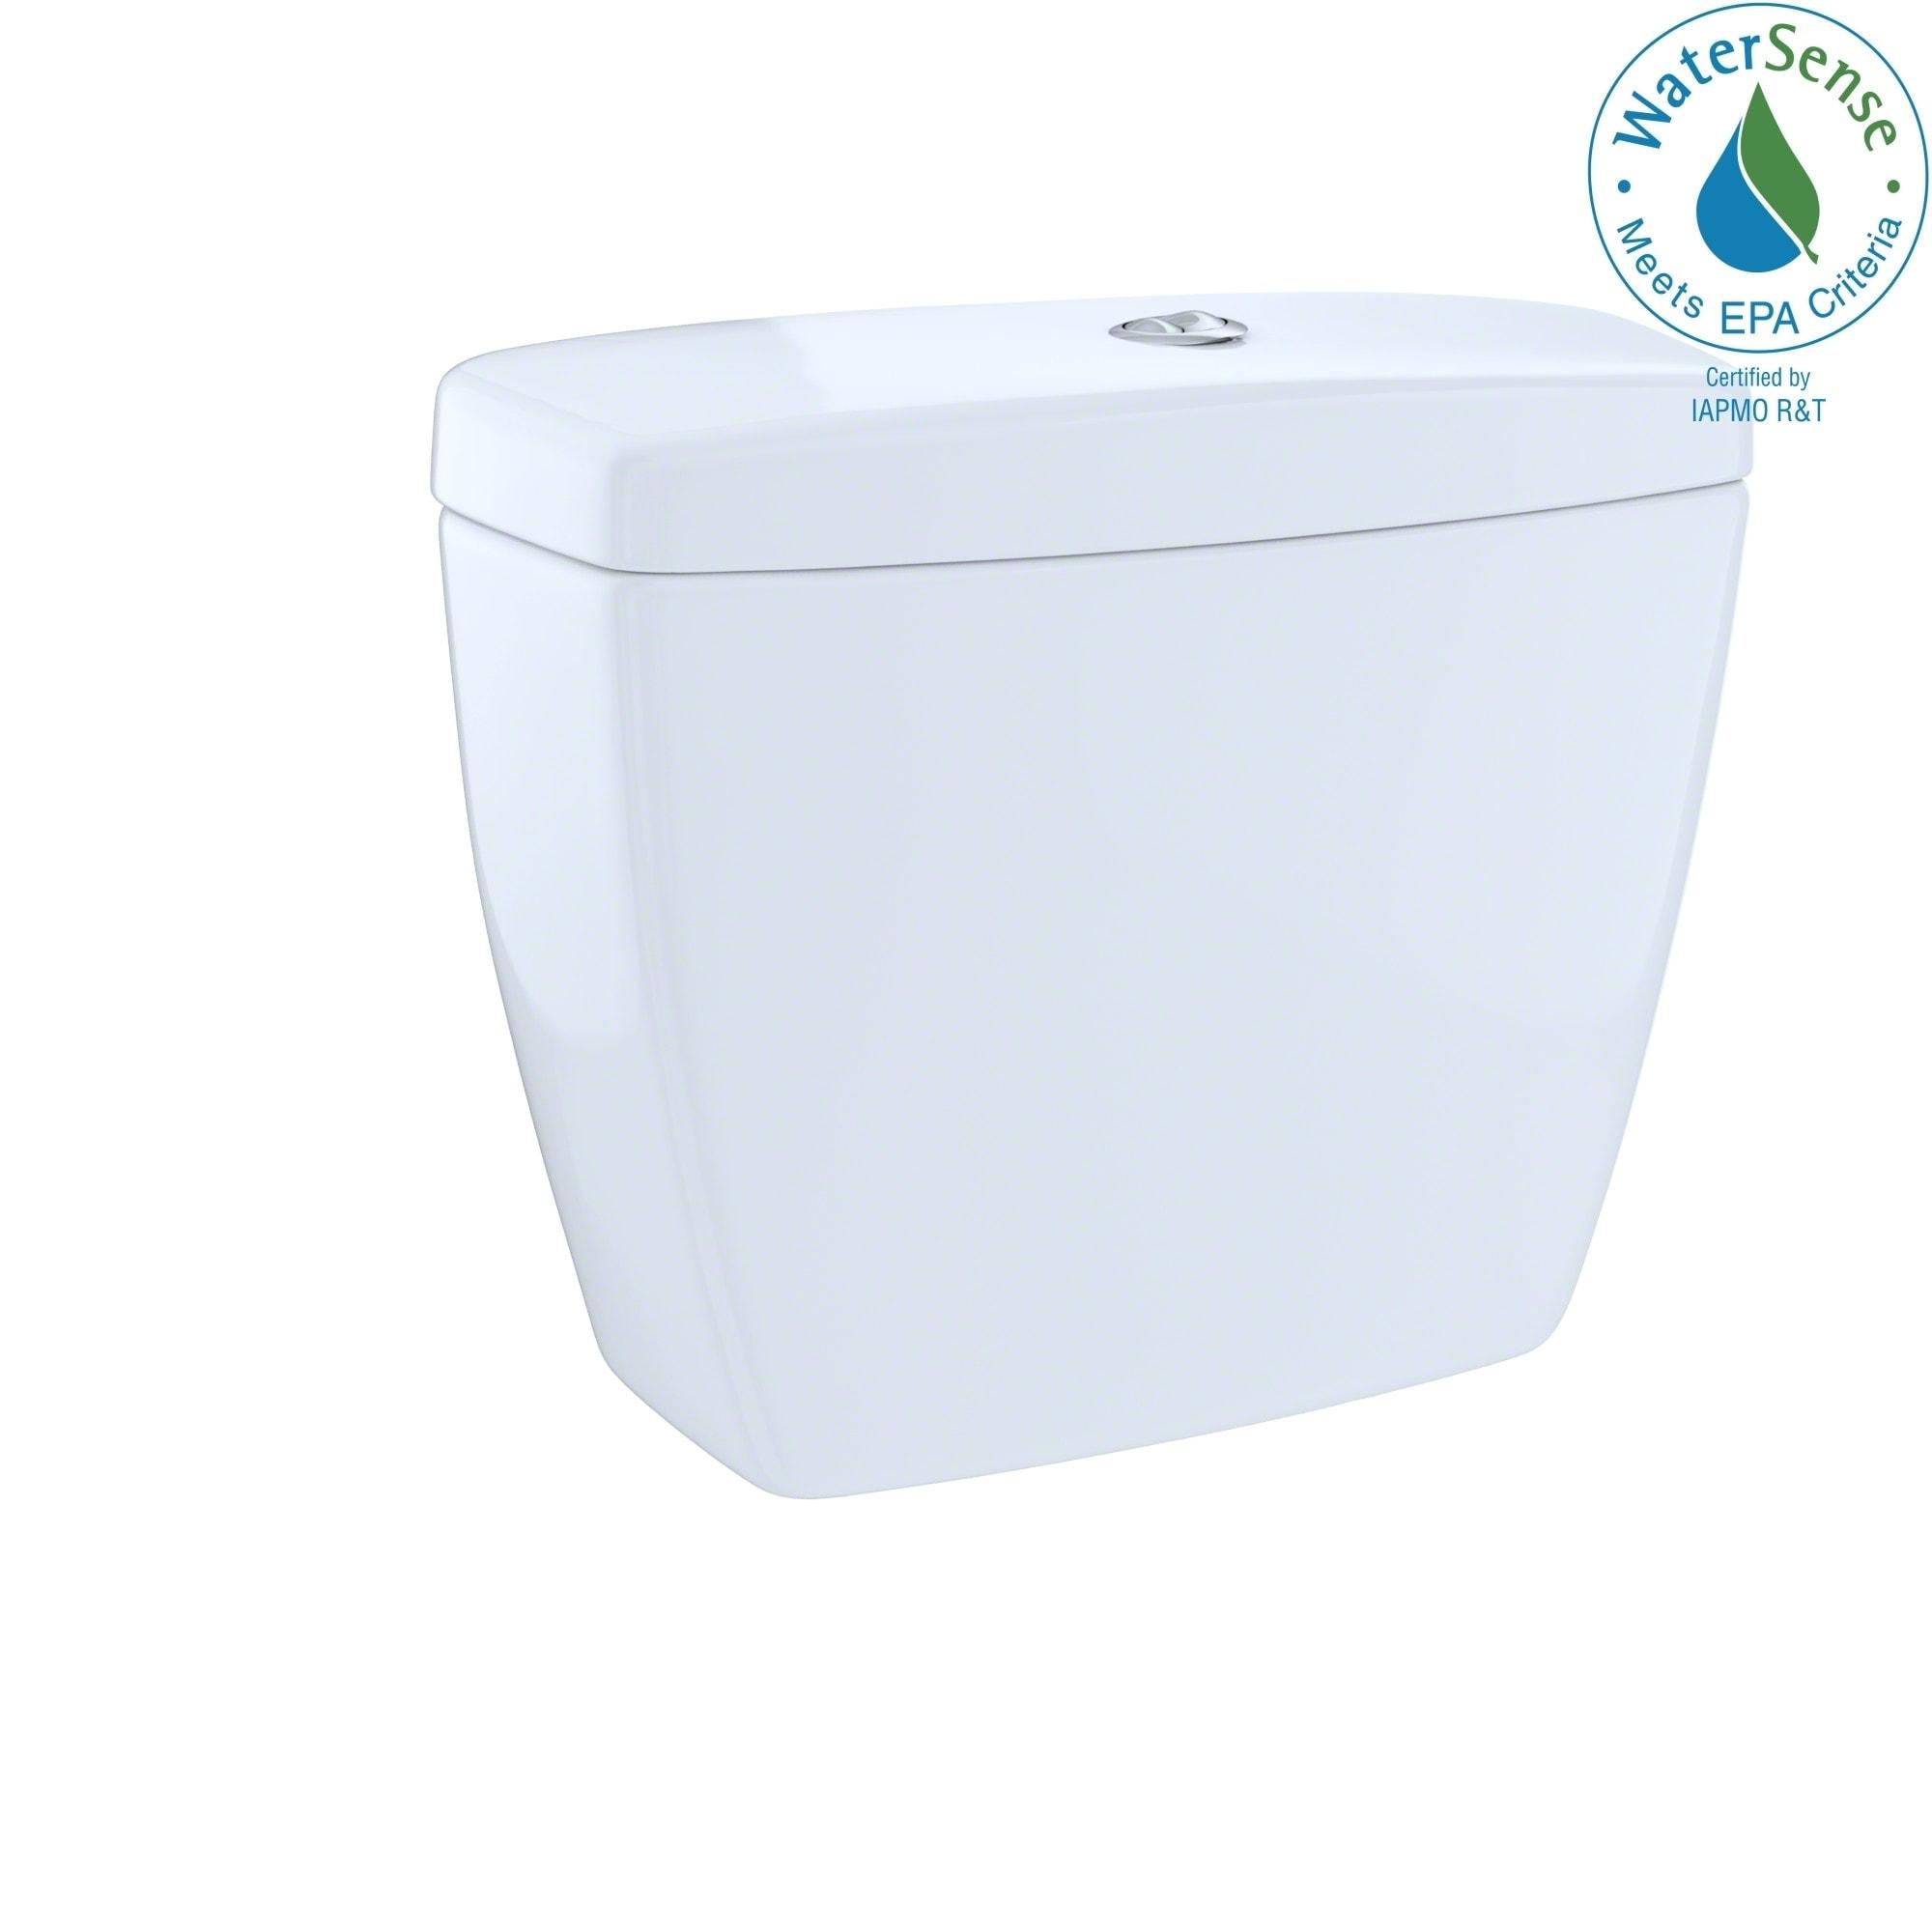 Toto Rowan Cotton Toilet Tank and Cover Only (Cotton White)